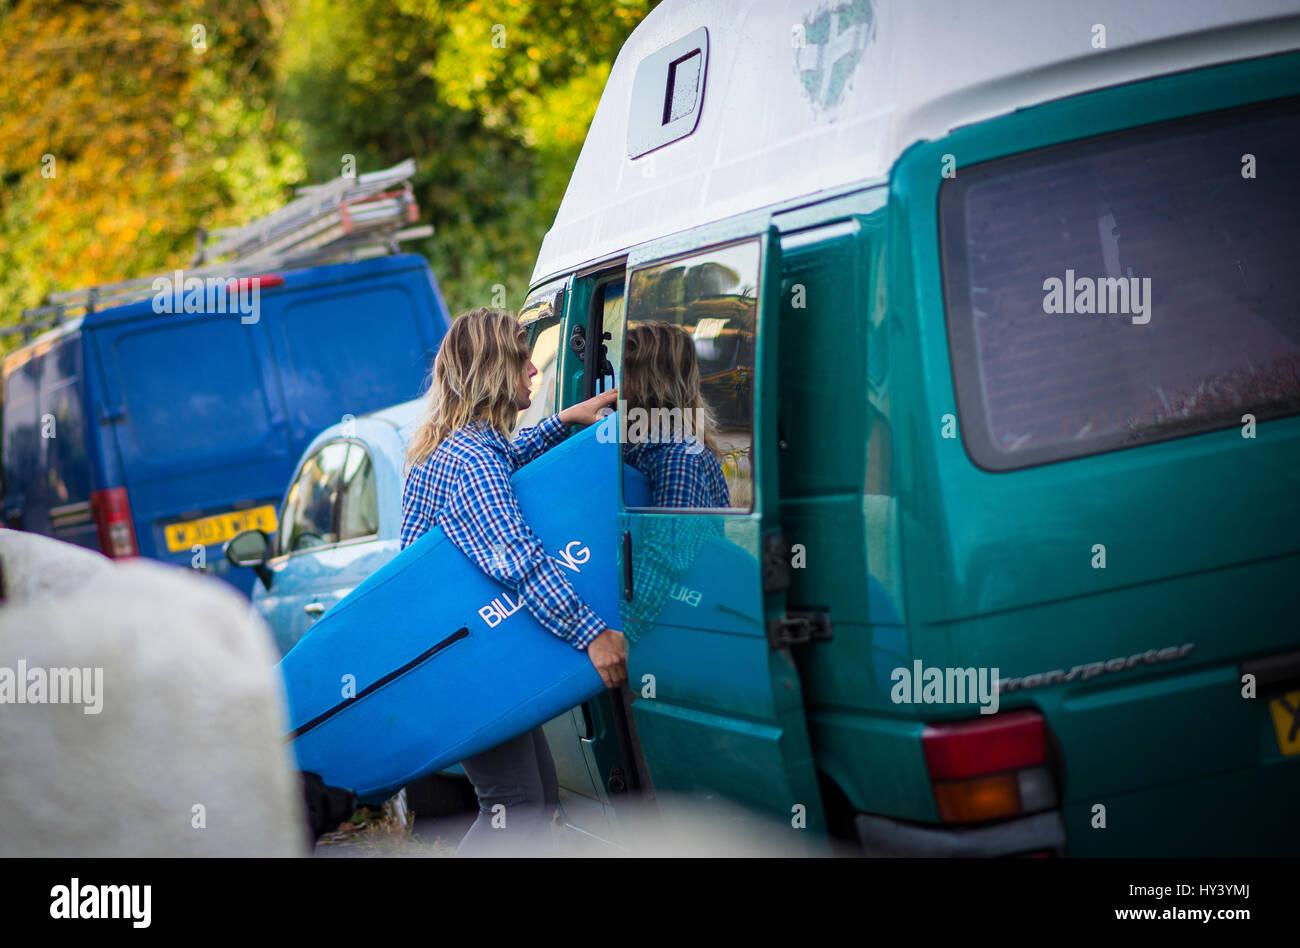 Loading up the Volkswagon camper van for a surf session at Bantham Beach, Devon, England, UK - Stock Image